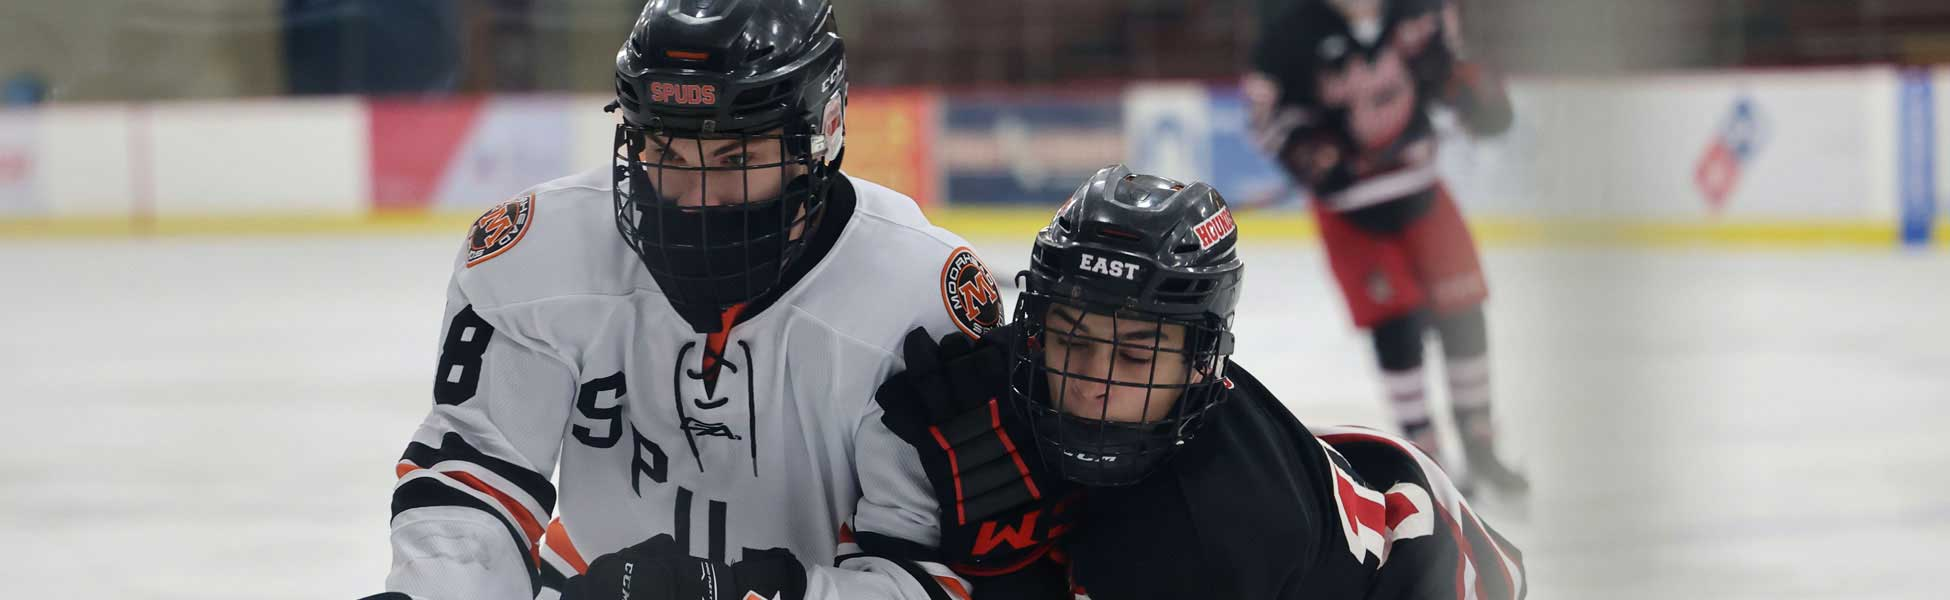 Boys Hockey Player